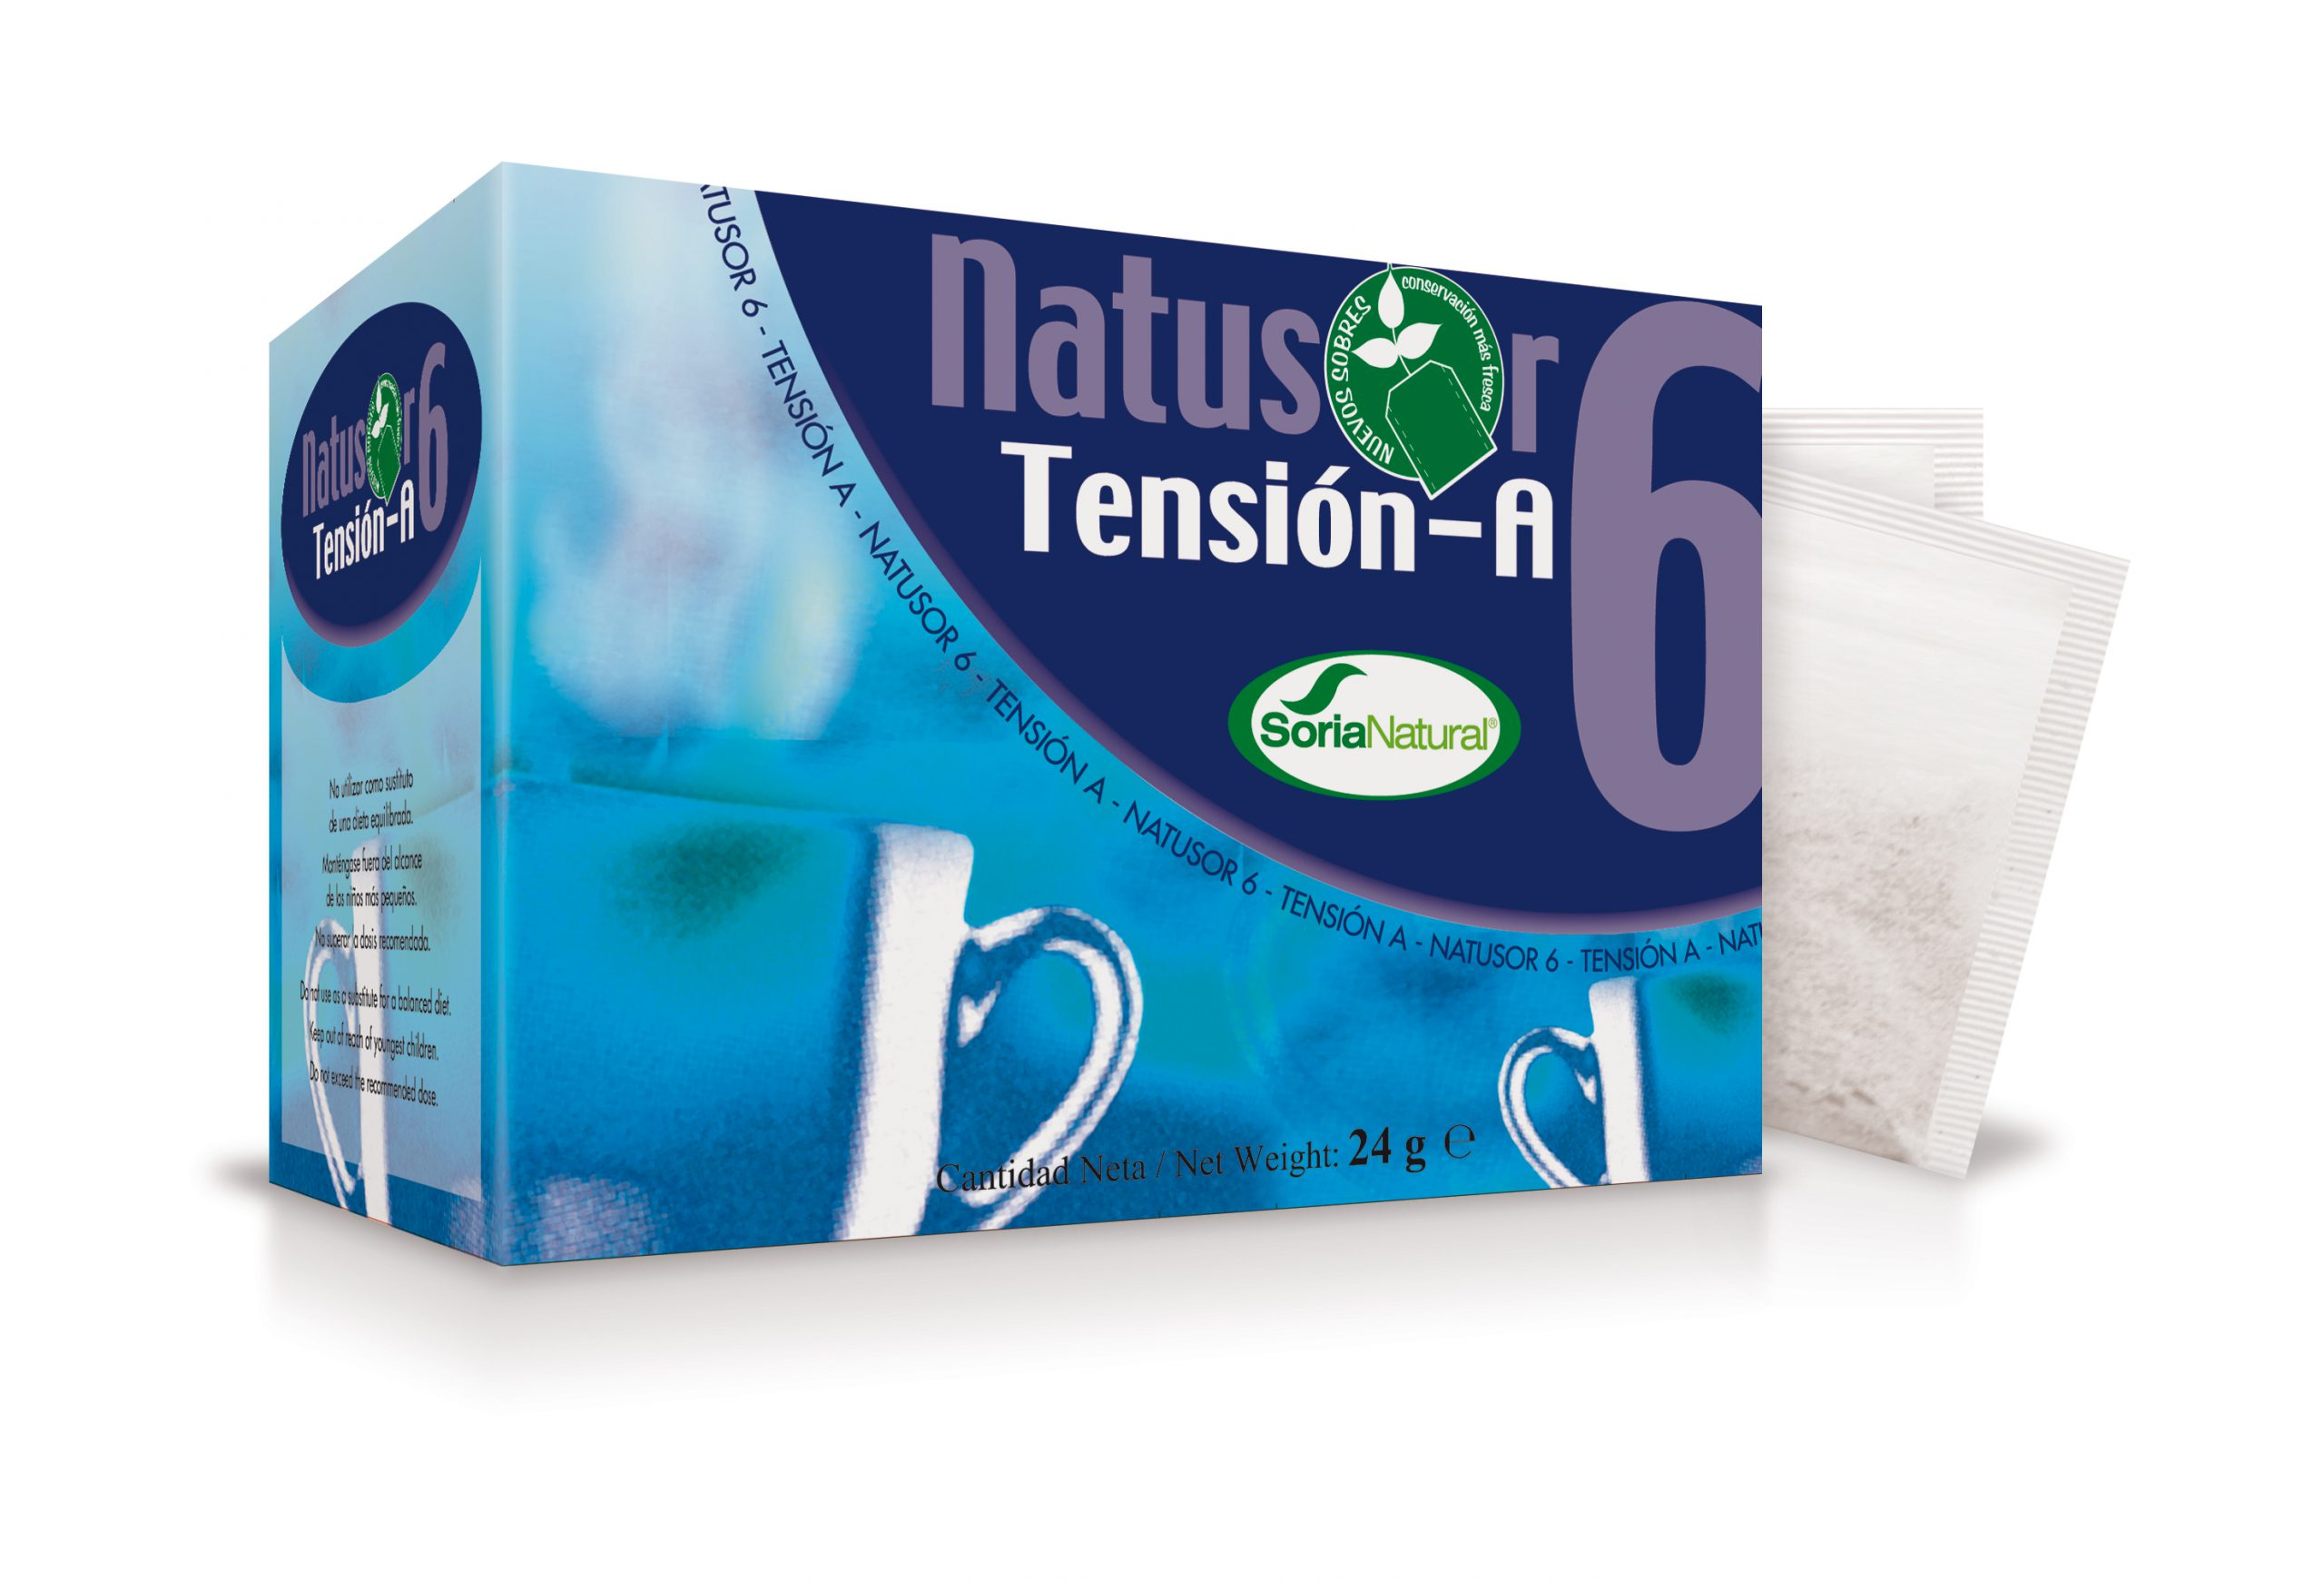 Natusor 06 Tension A